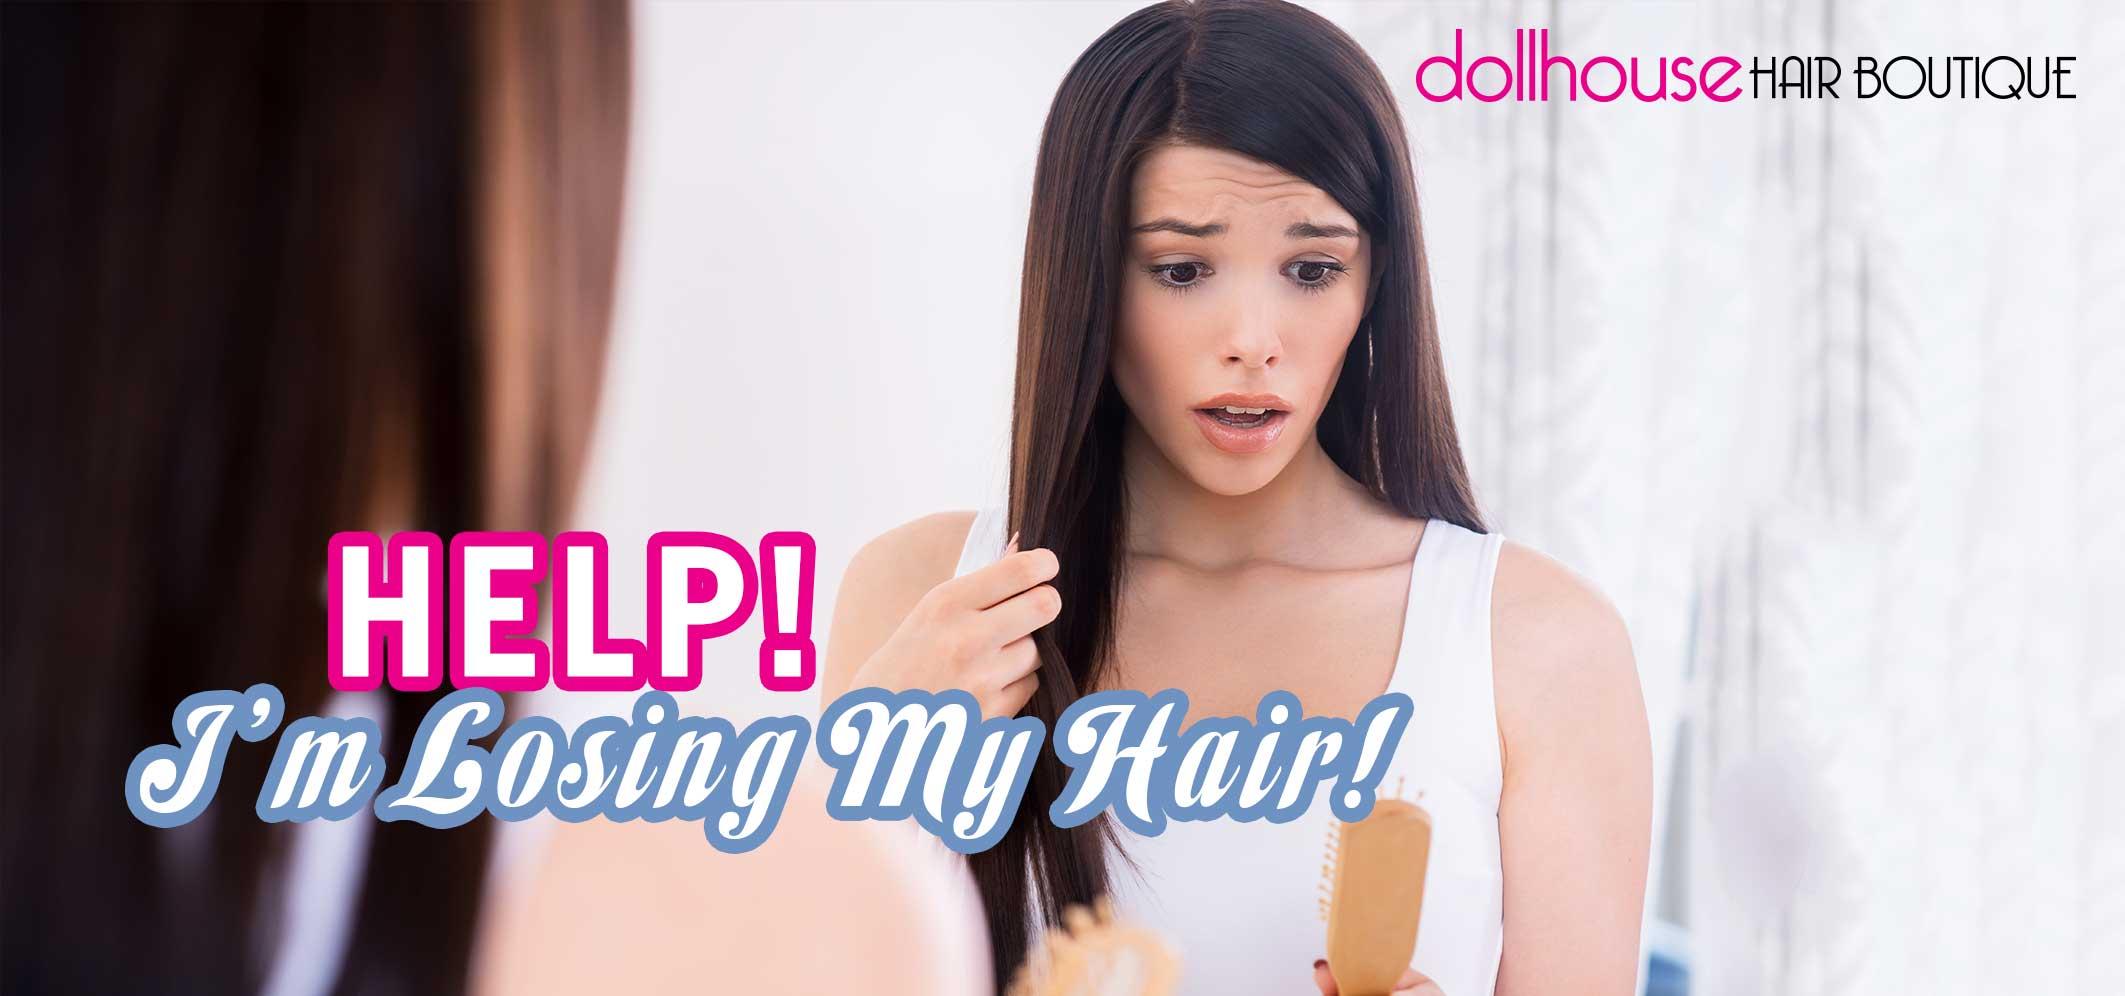 I'm-Losing-My-Hair!